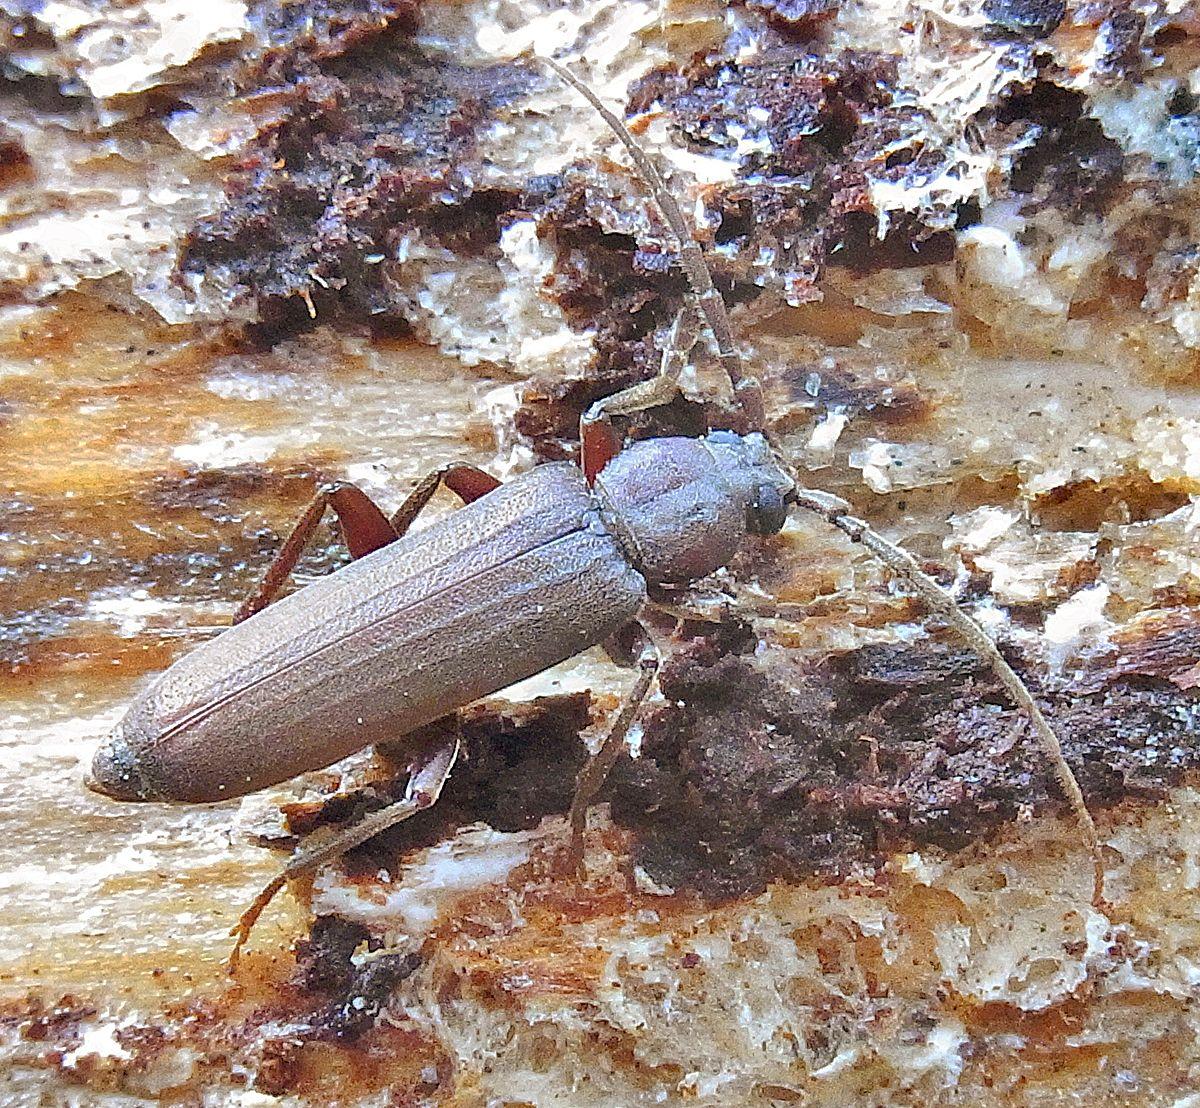 Arhopalus rusticus - Wikispecies